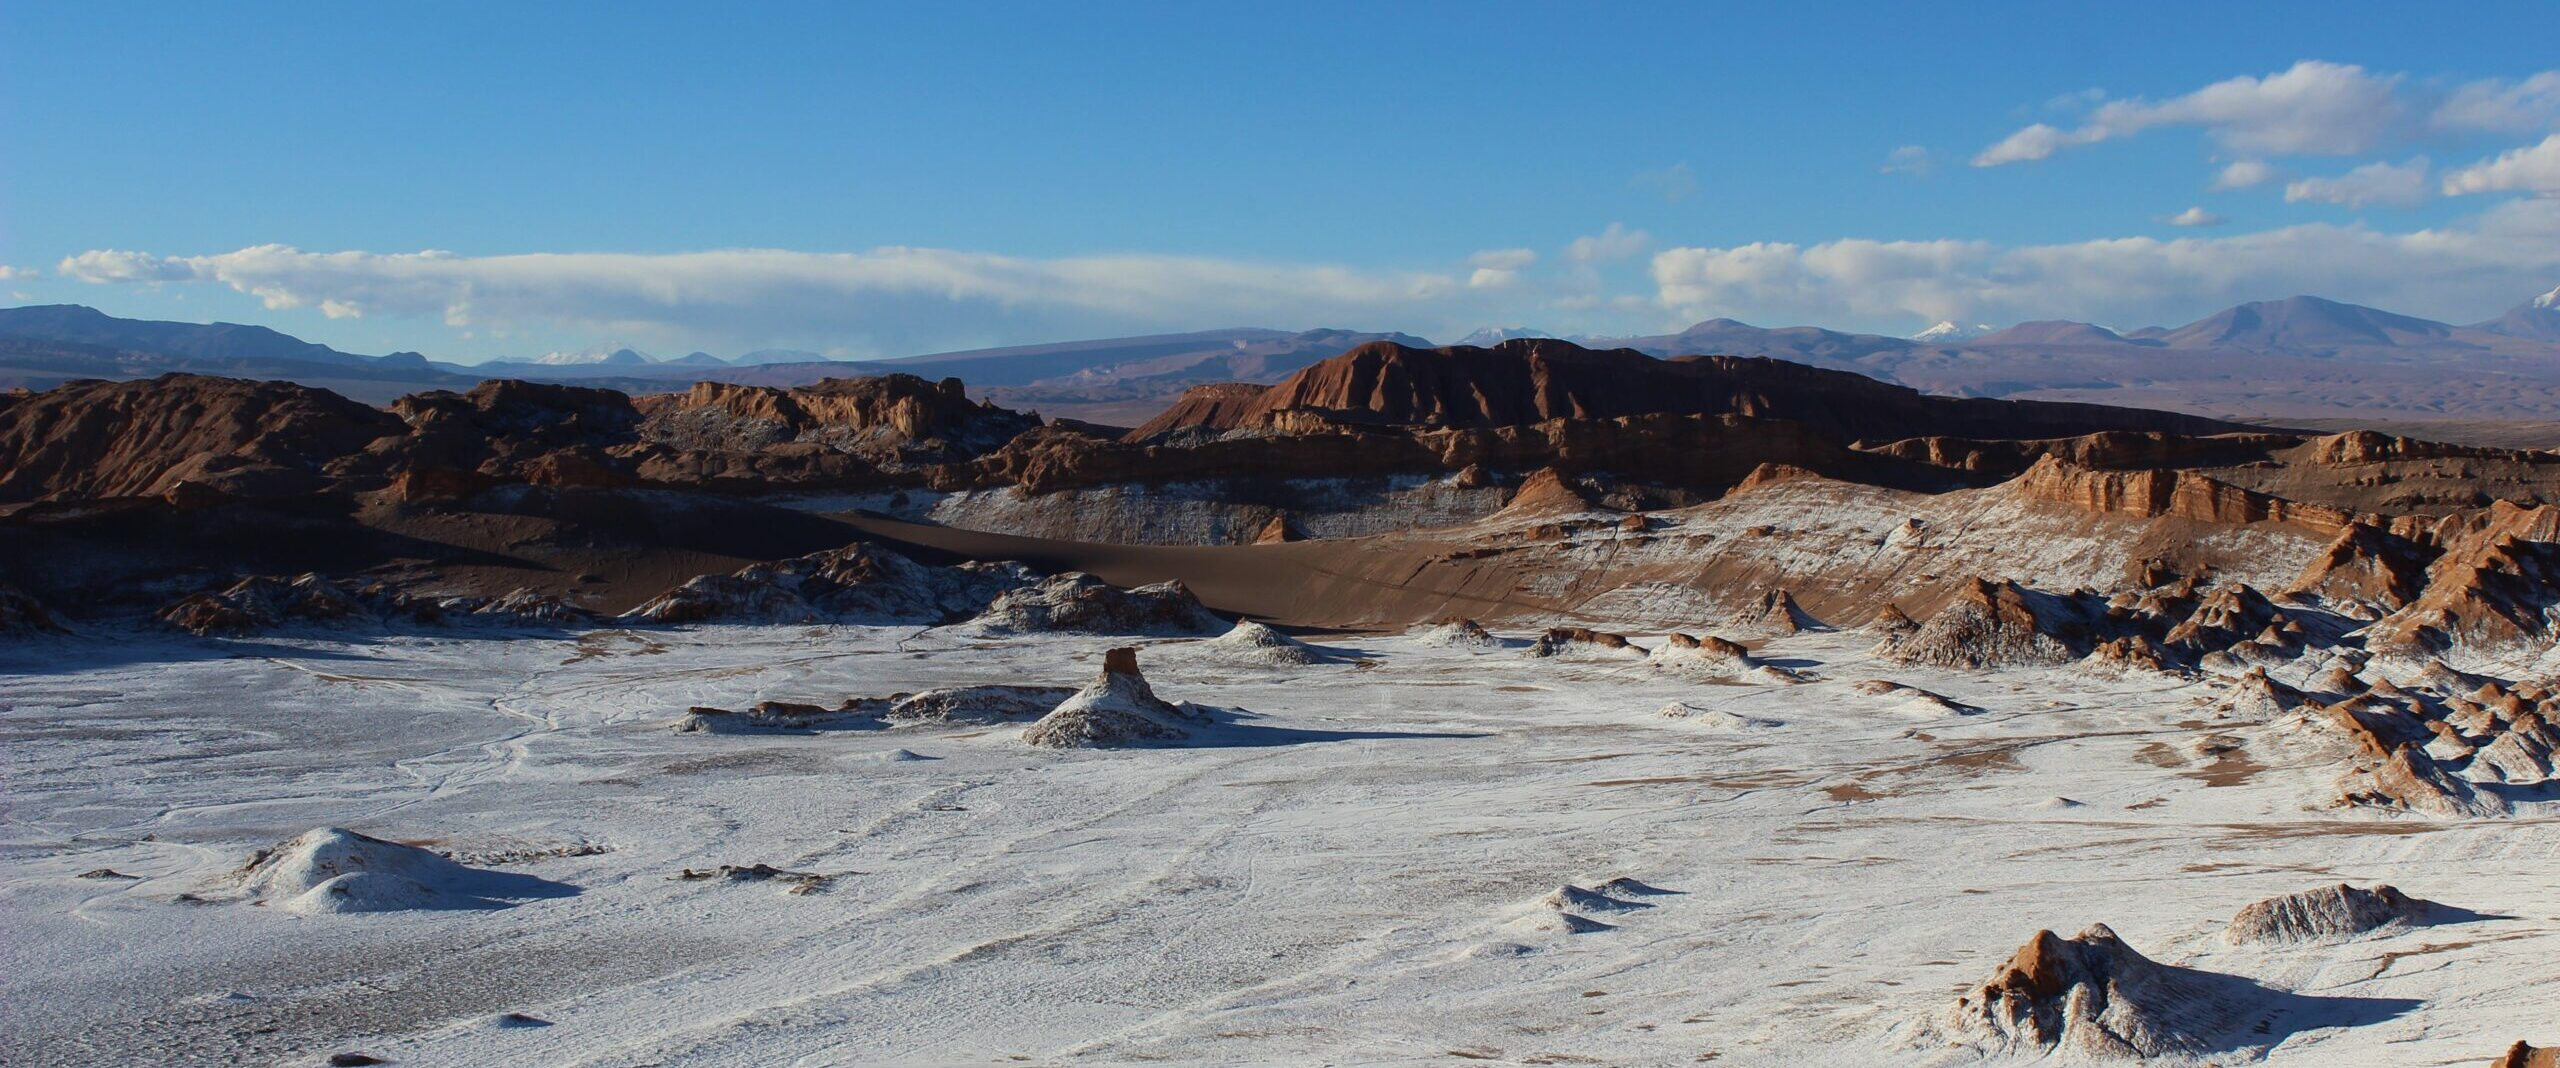 18 – San Pedro de Atacama und Altiplano